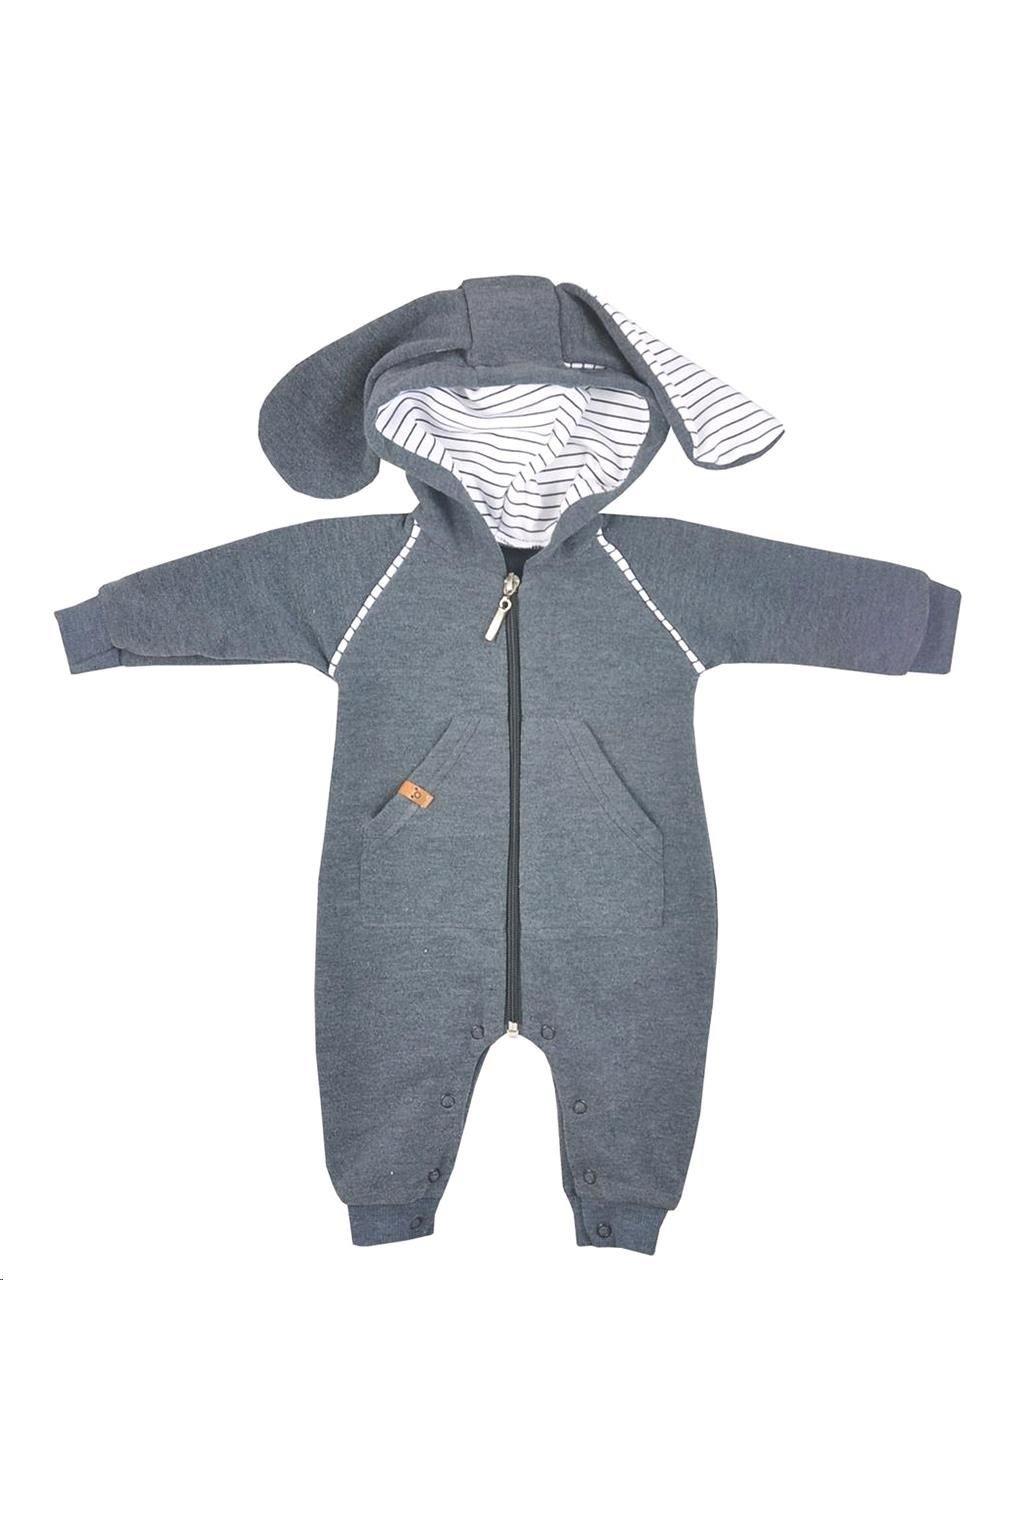 Dojčenský overal s kapucňou Koala Ušiačik sivý